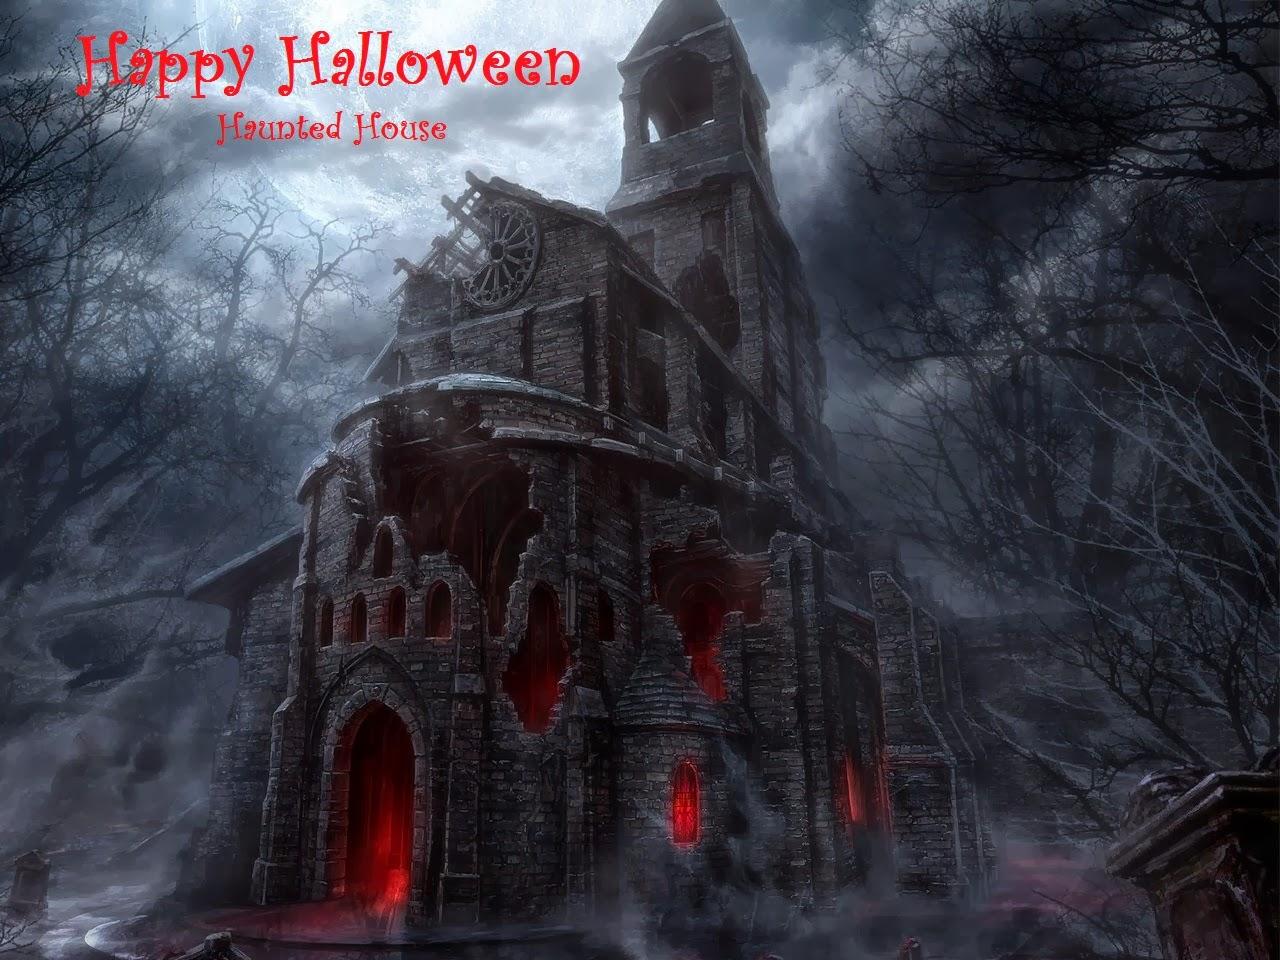 Haunted House Photos Download on Halloween   Festival Chaska 1280x960